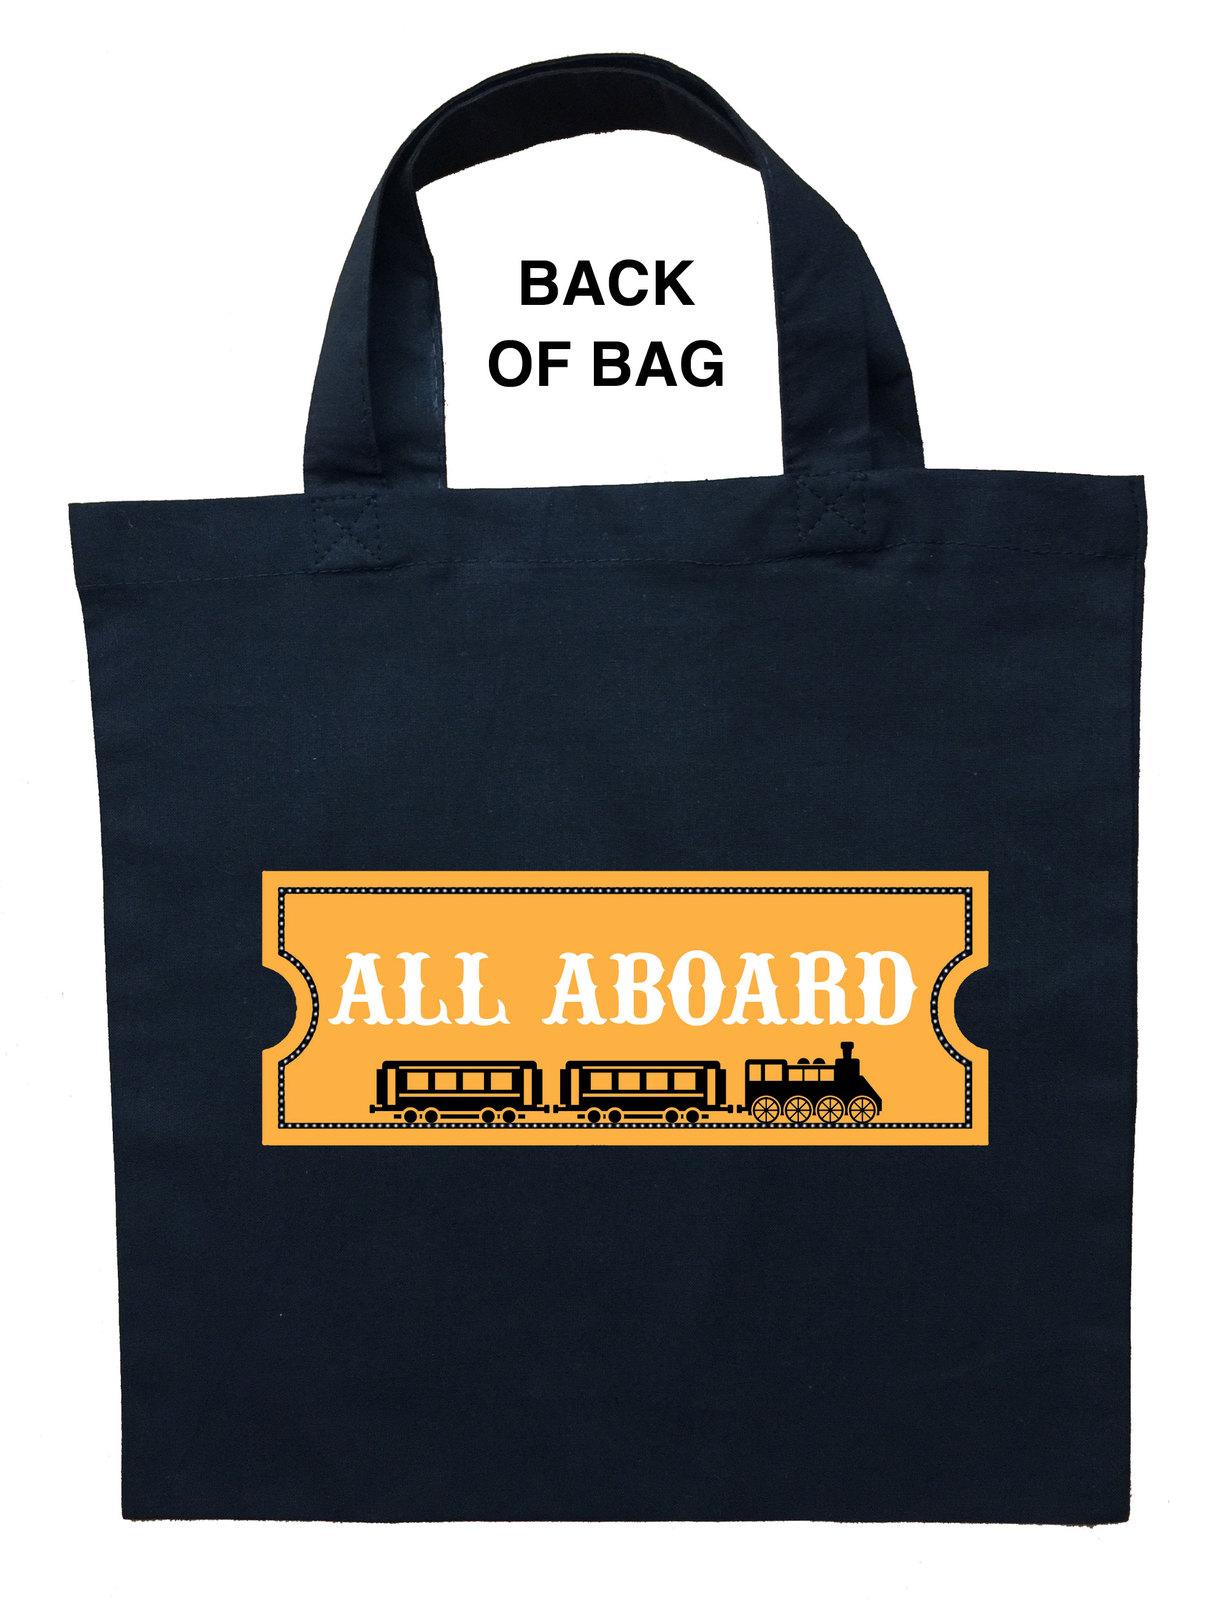 Train Conductor Trick or Treat Bag, Train Conductor Halloween Bag